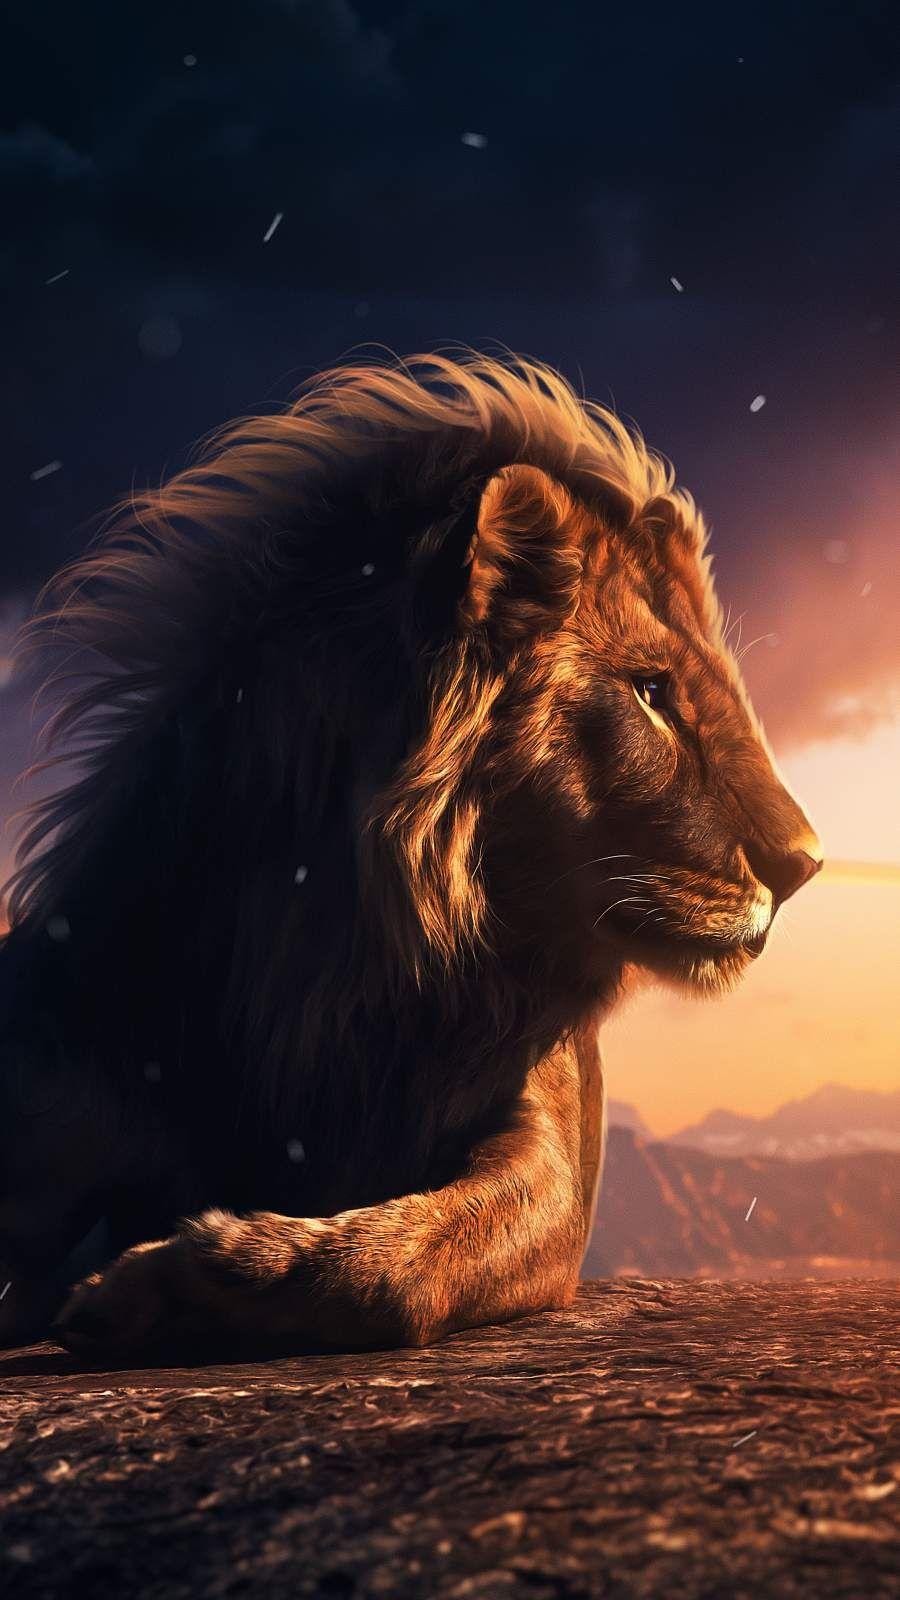 Lion King 4K iPhone Wallpaper - iPhone Wallpapers